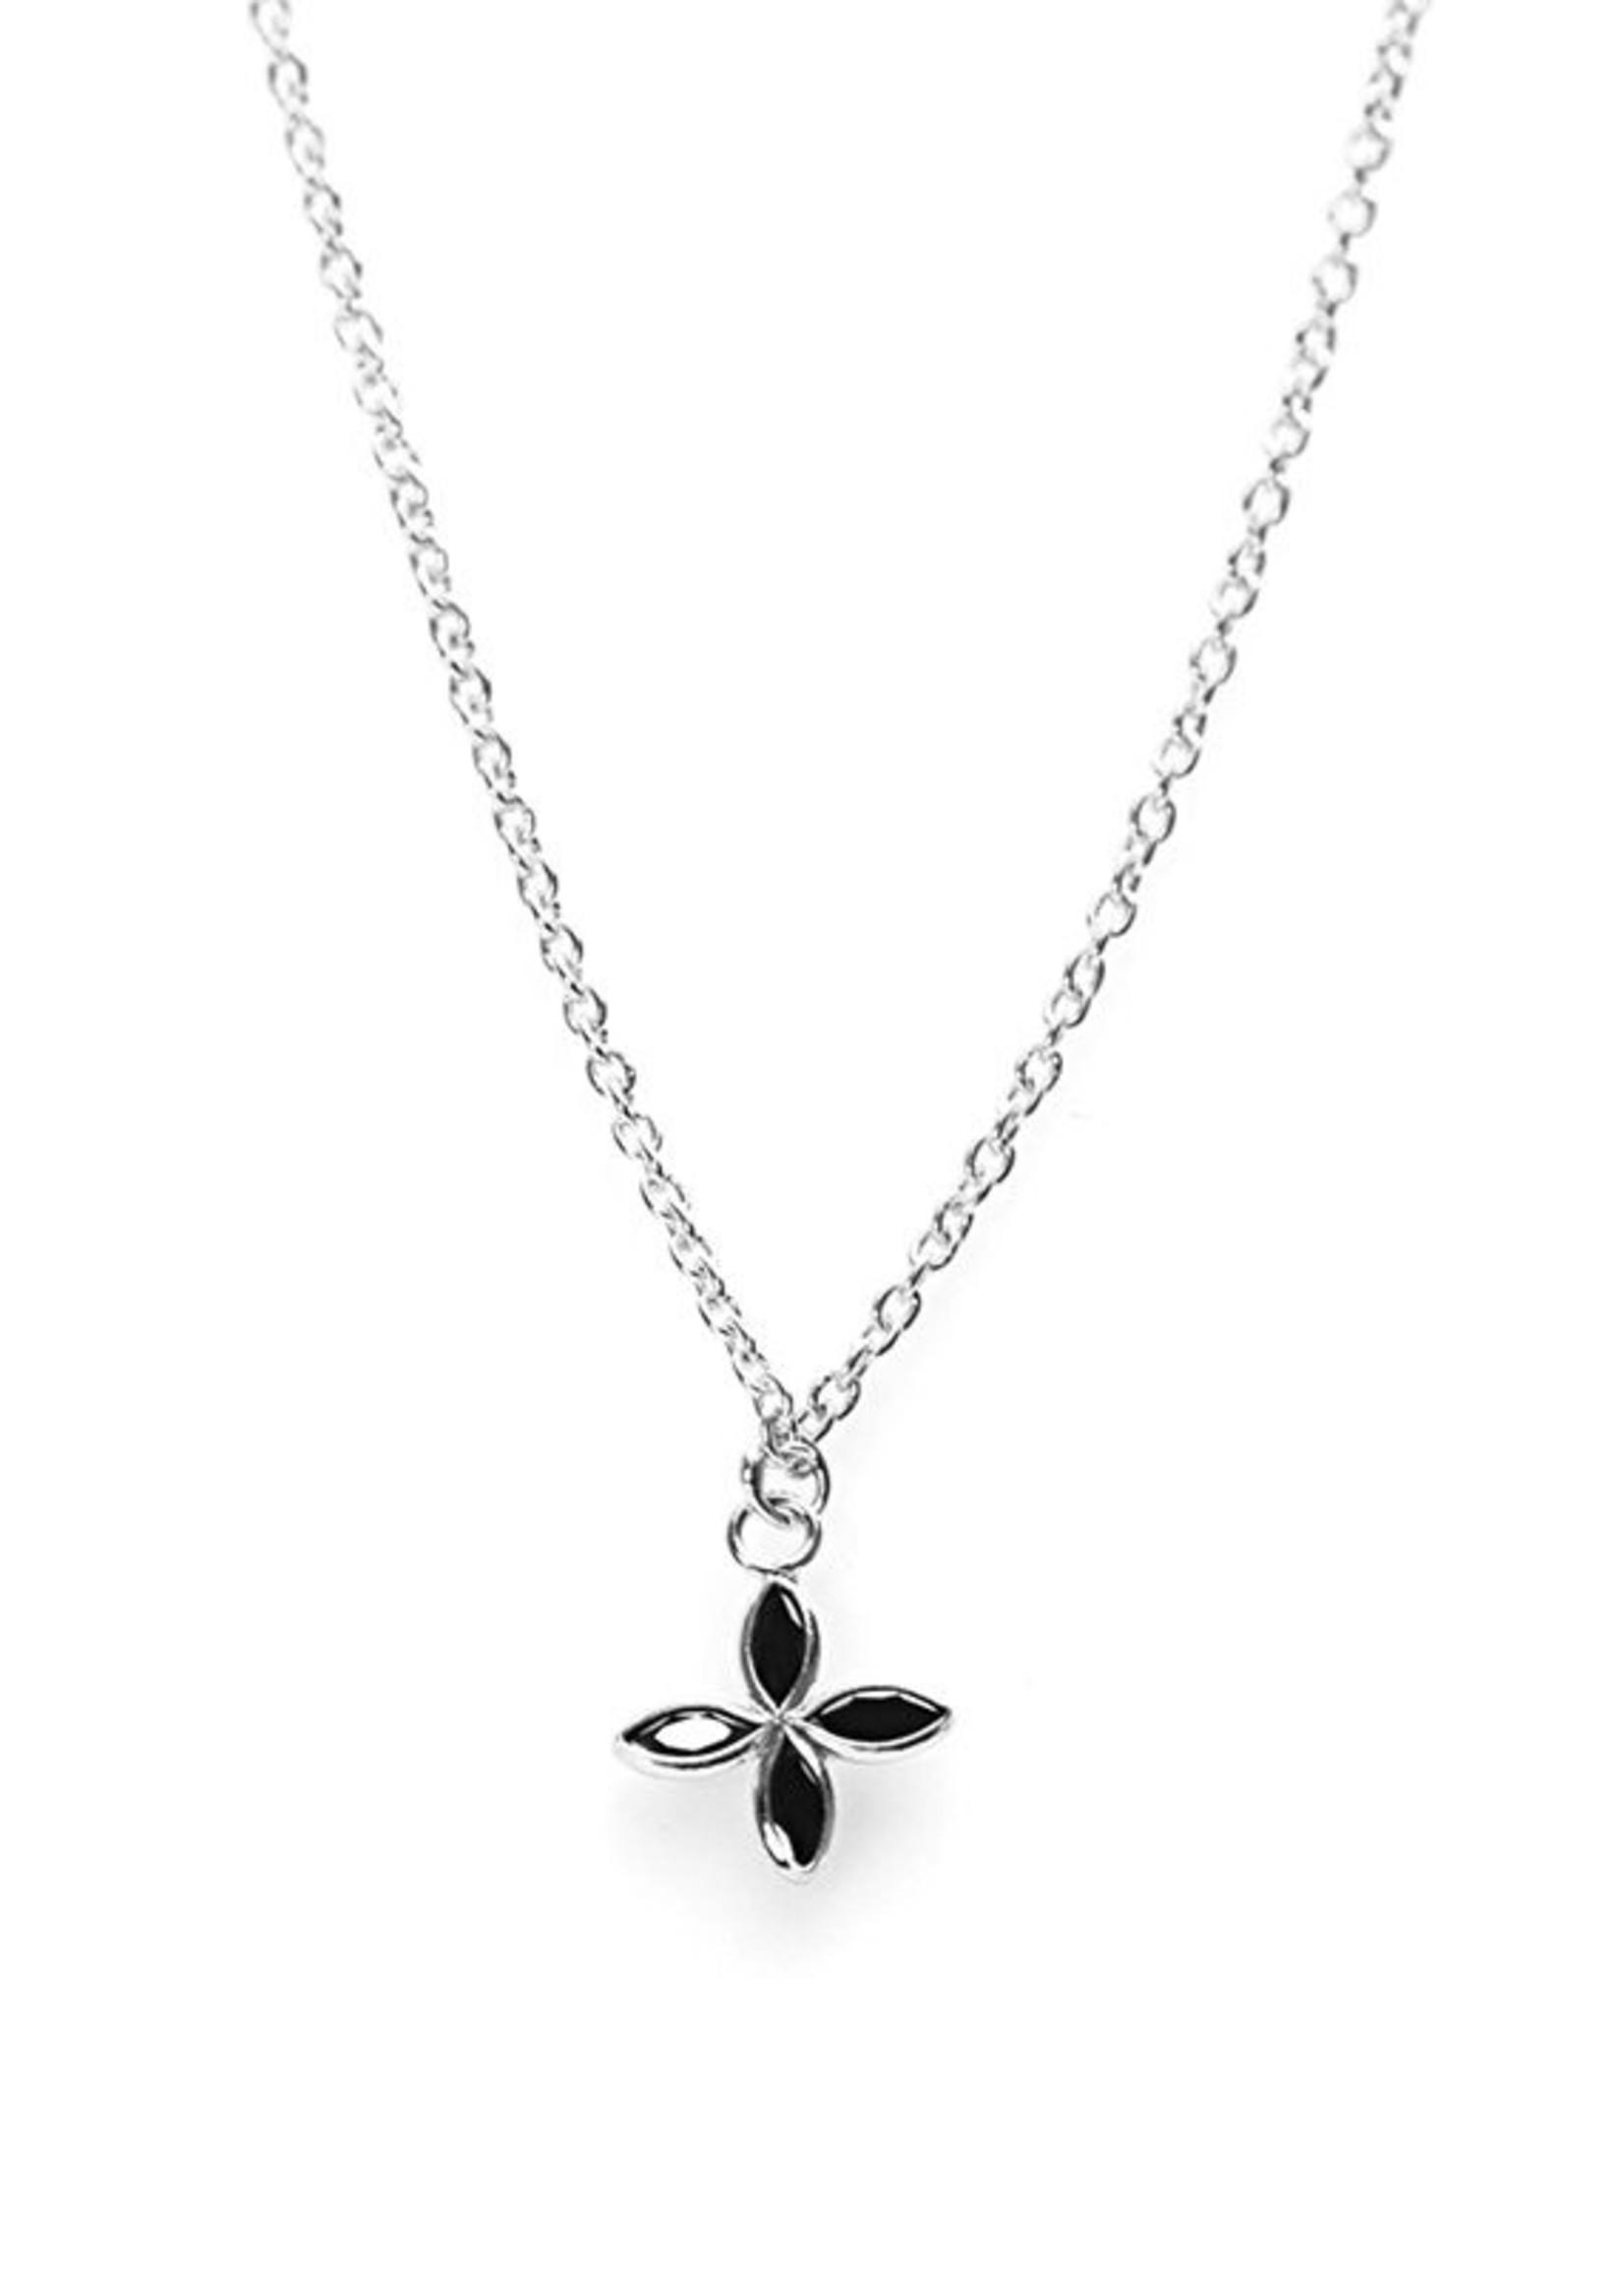 Karma Necklace Black Zirconia Flower Silver